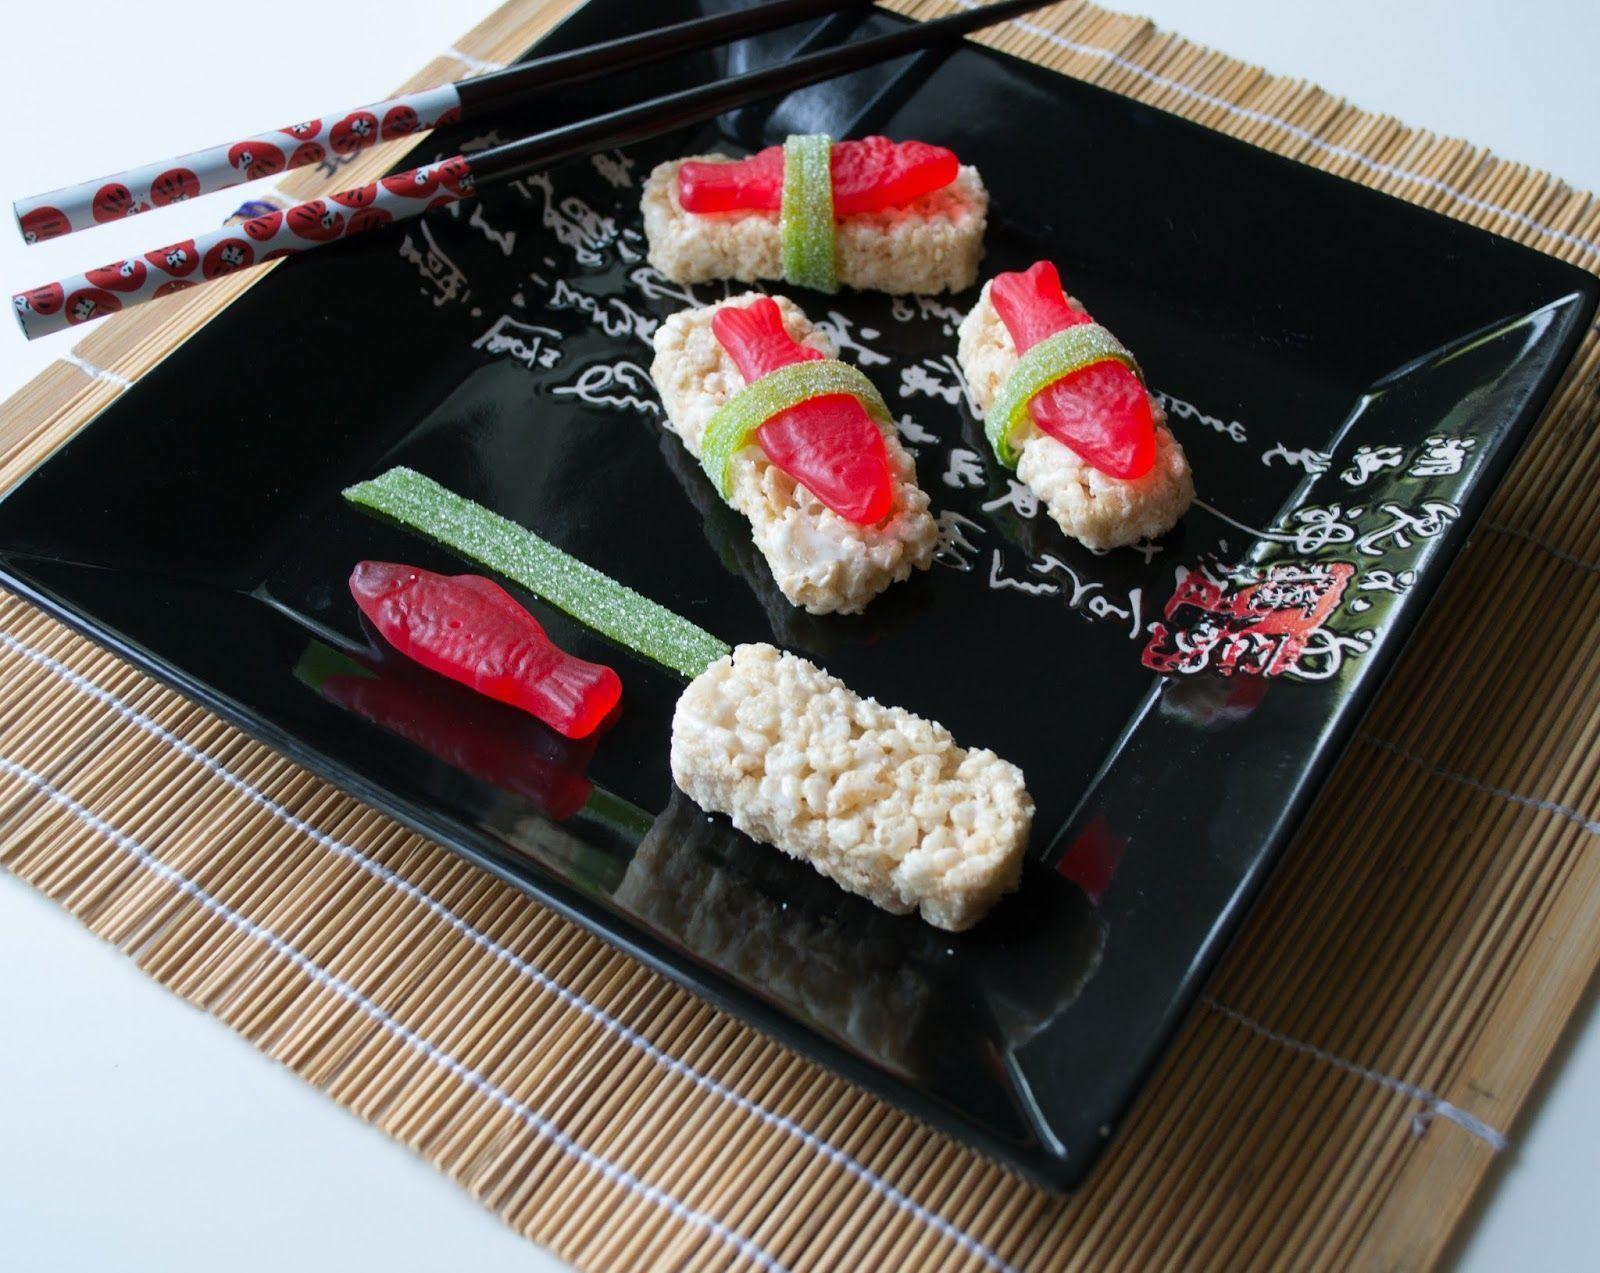 Easy Candy Sushi! #candysushi Easy Candy Sushi! #candysushi Easy Candy Sushi! #candysushi Easy Candy Sushi! #candysushi Easy Candy Sushi! #candysushi Easy Candy Sushi! #candysushi Easy Candy Sushi! #candysushi Easy Candy Sushi! #candysushi